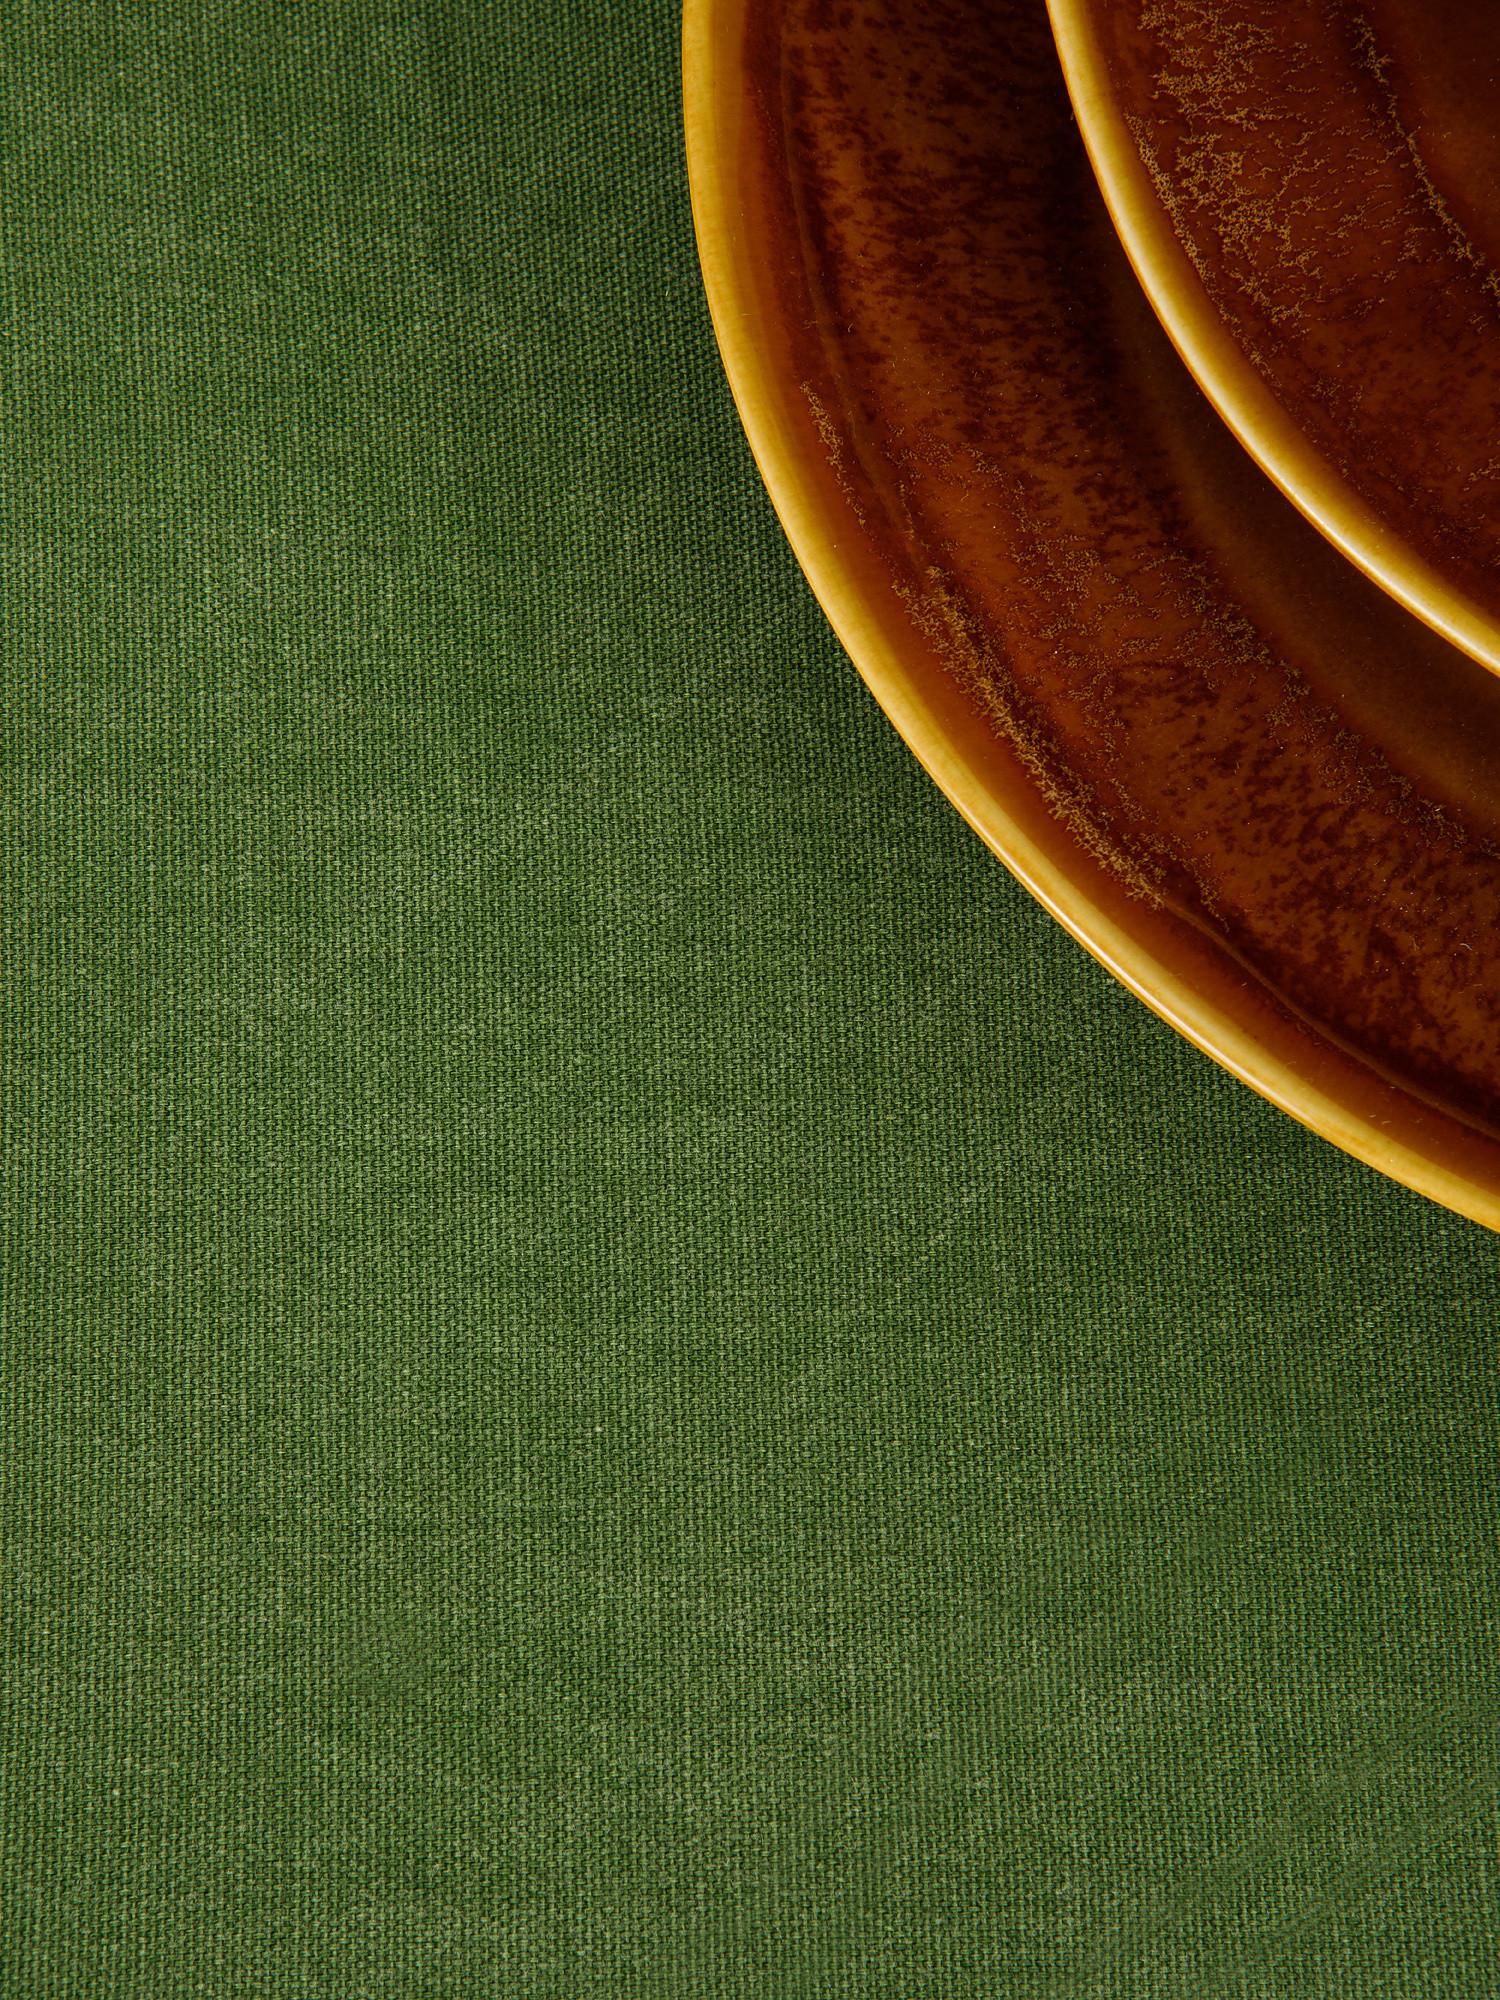 Tovaglia puro cotone garment washed tinta unita, Verde, large image number 2